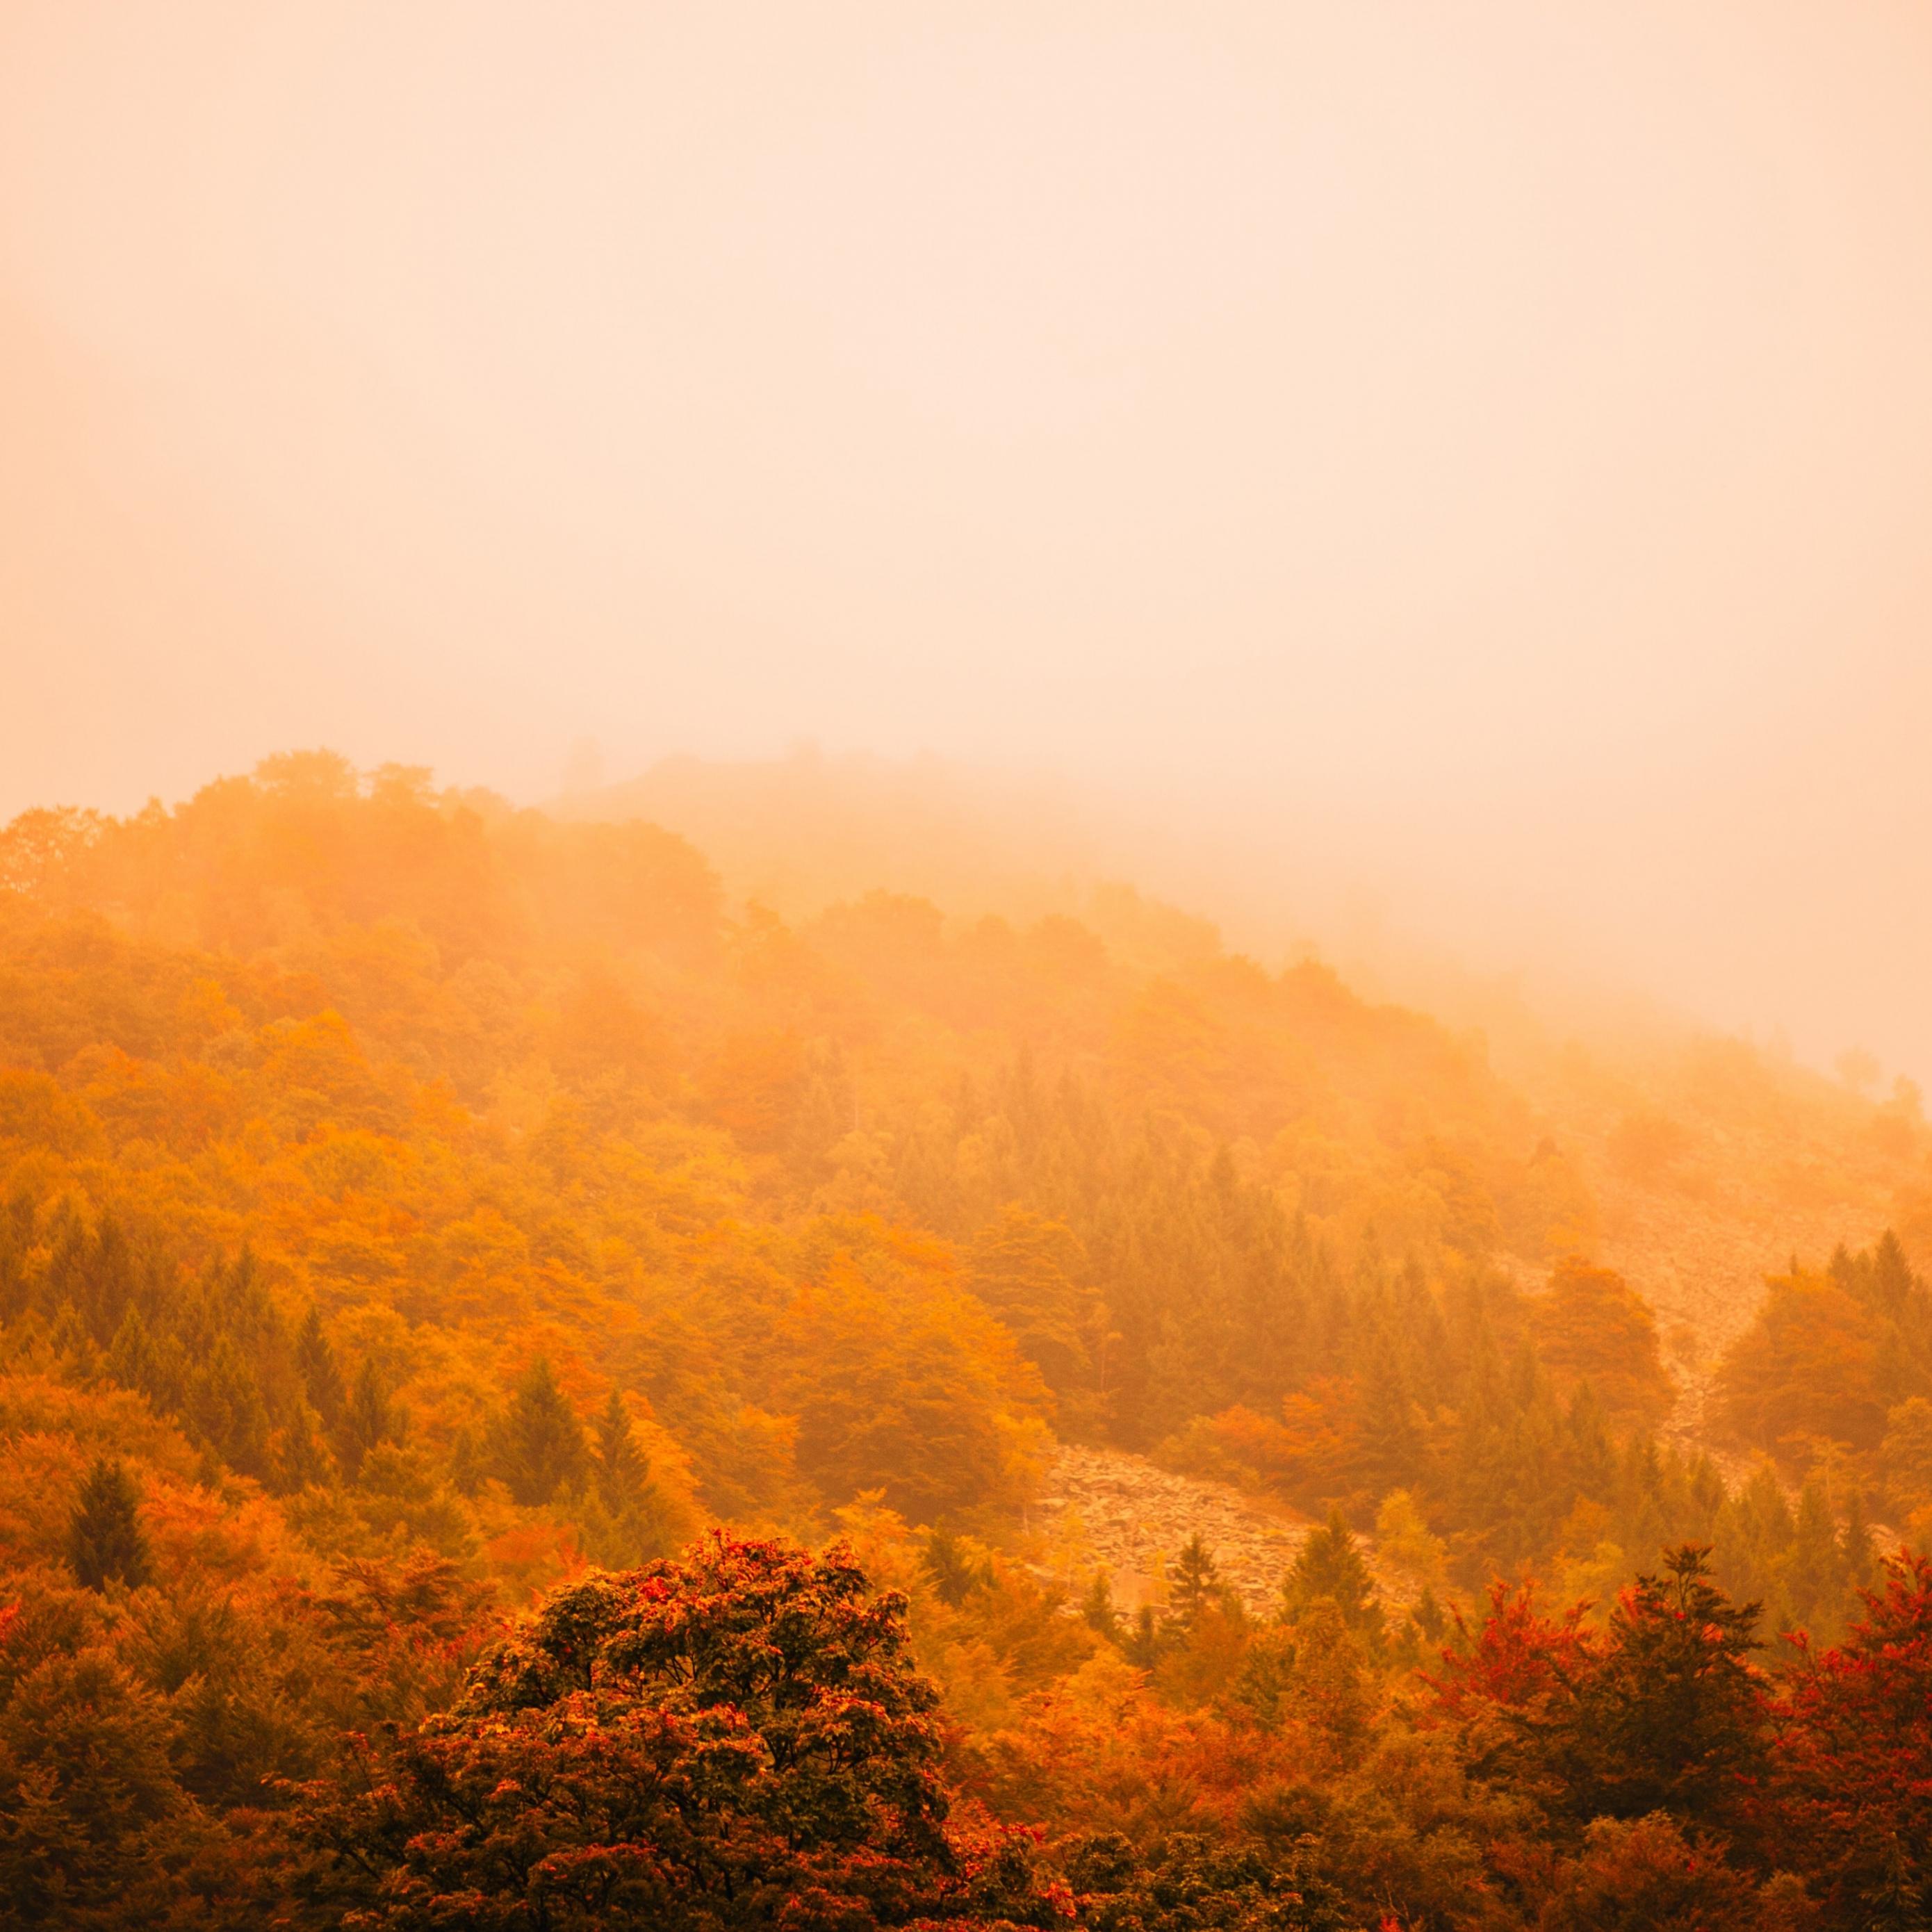 Download fog autumn forest mountain 5k 22856 Apple iPad Air 2780x2780